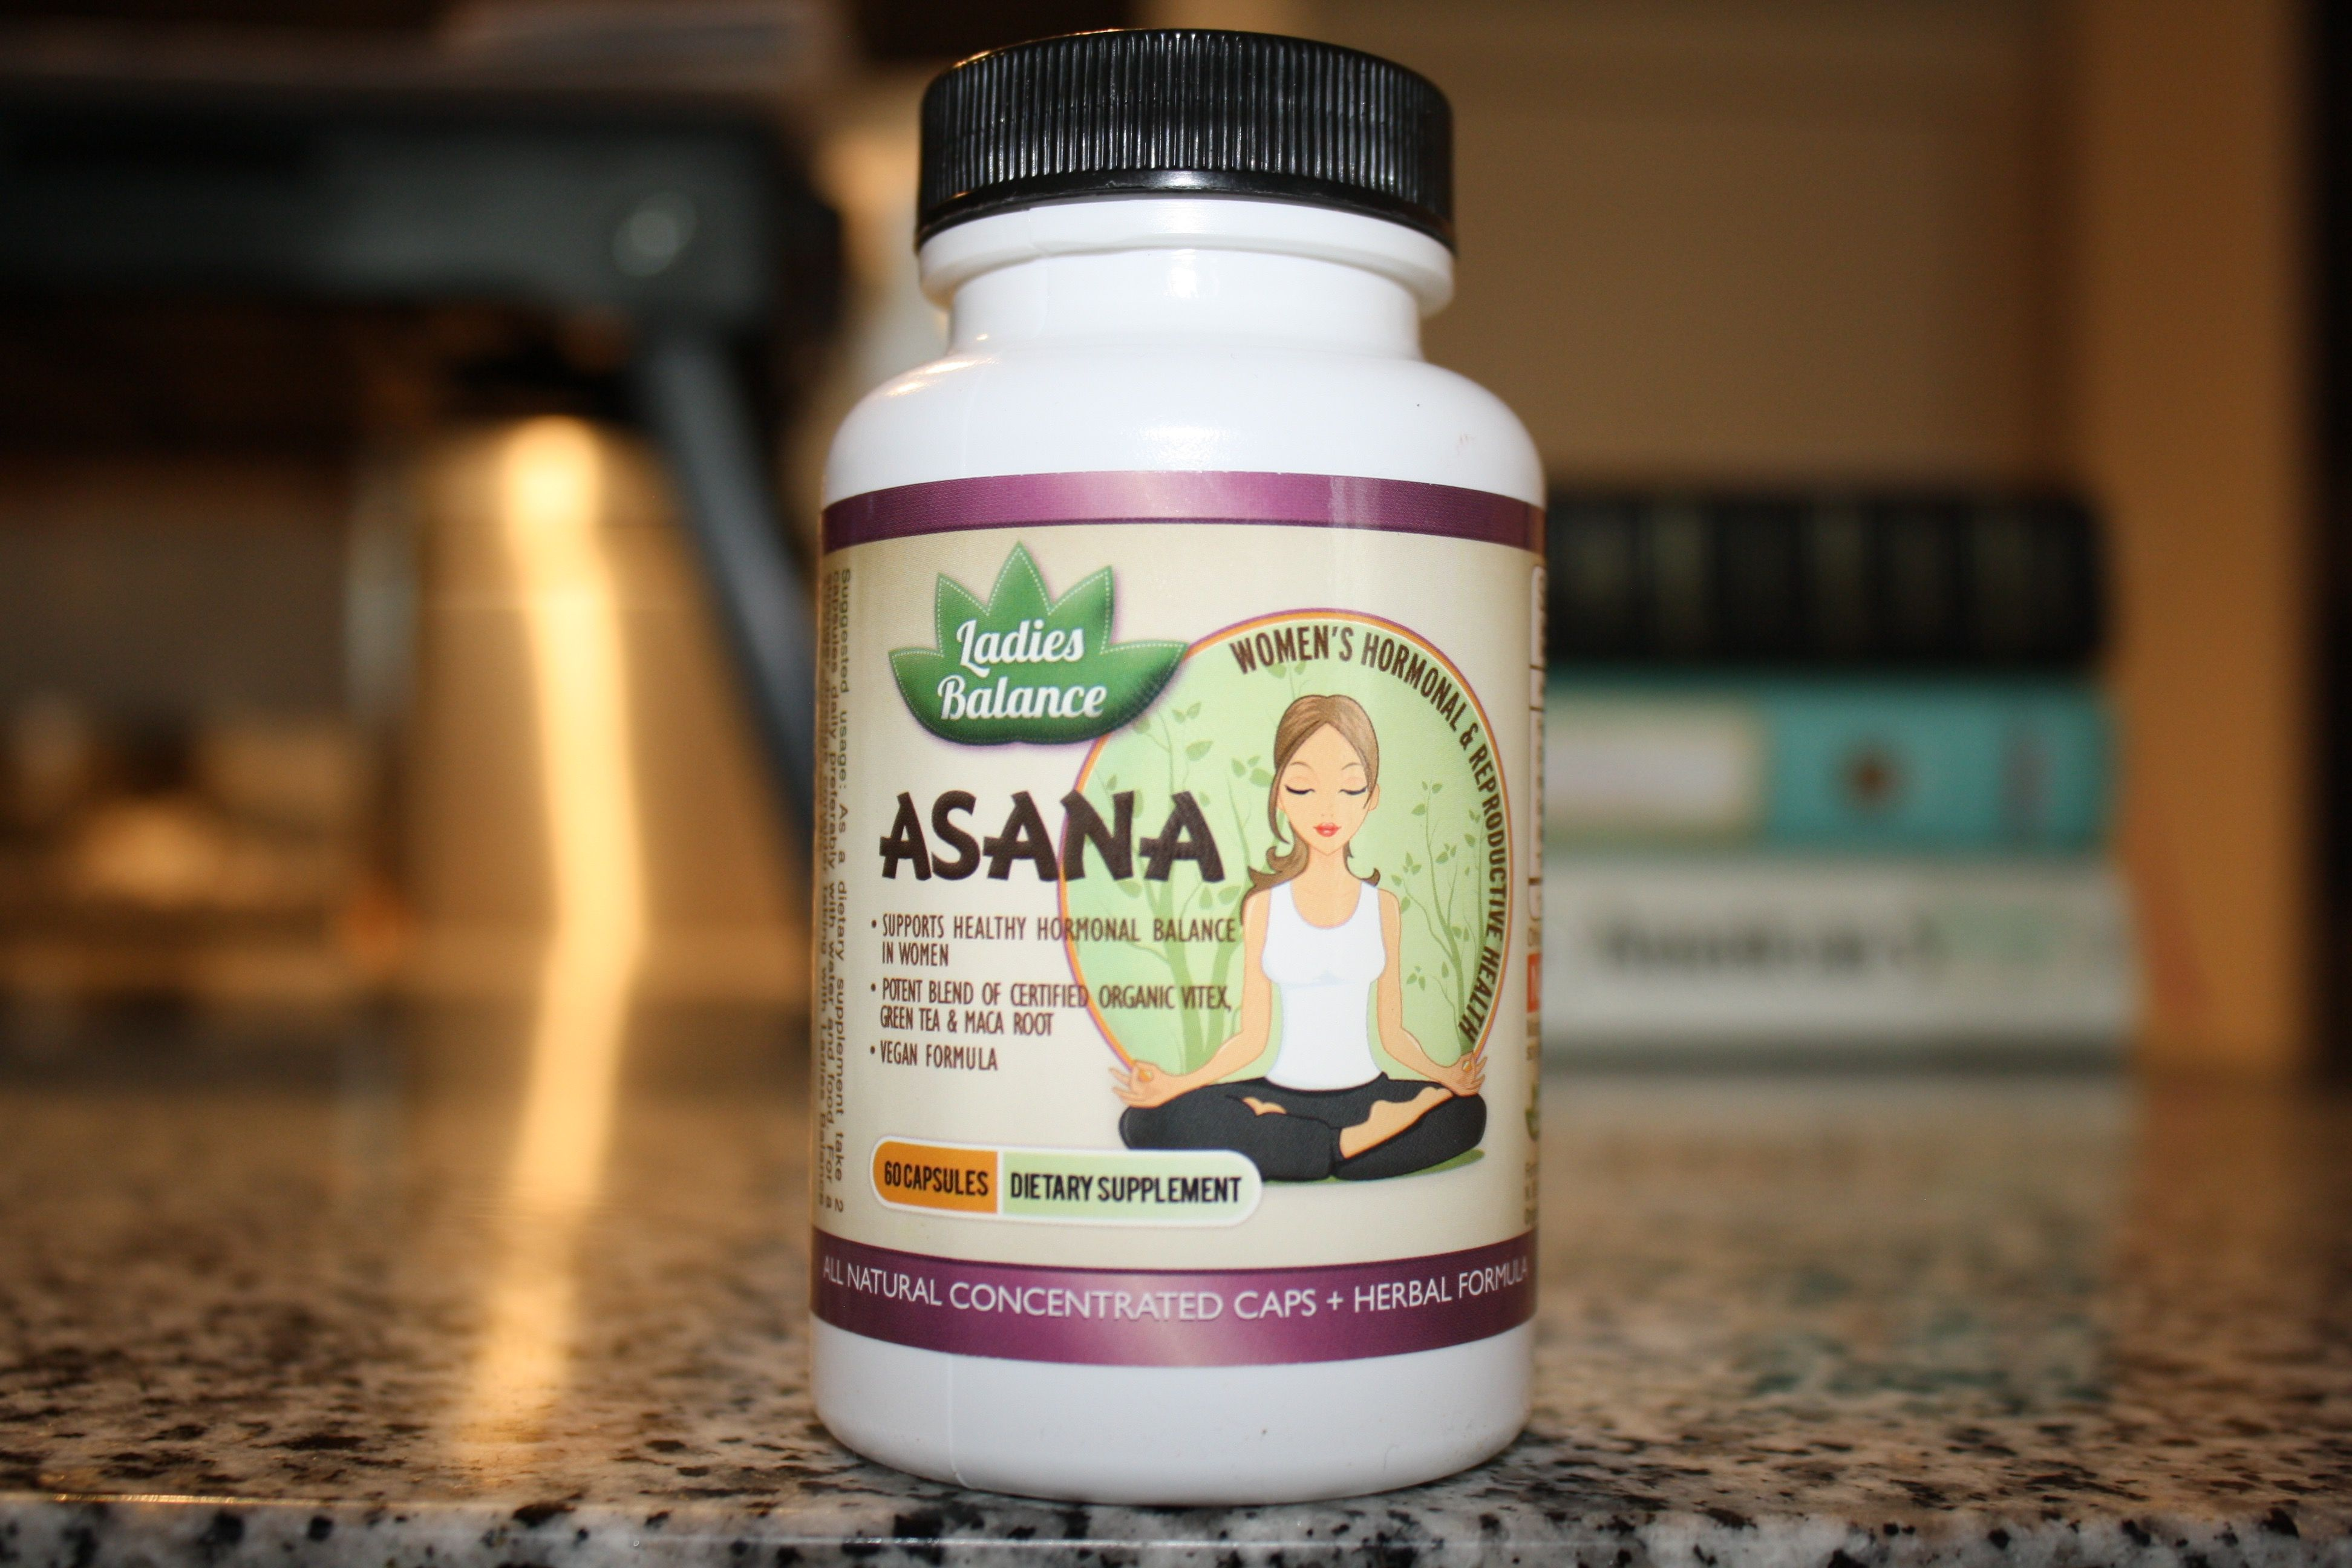 Asana by LadiesBalance women's health, beauty and menstrual cycle